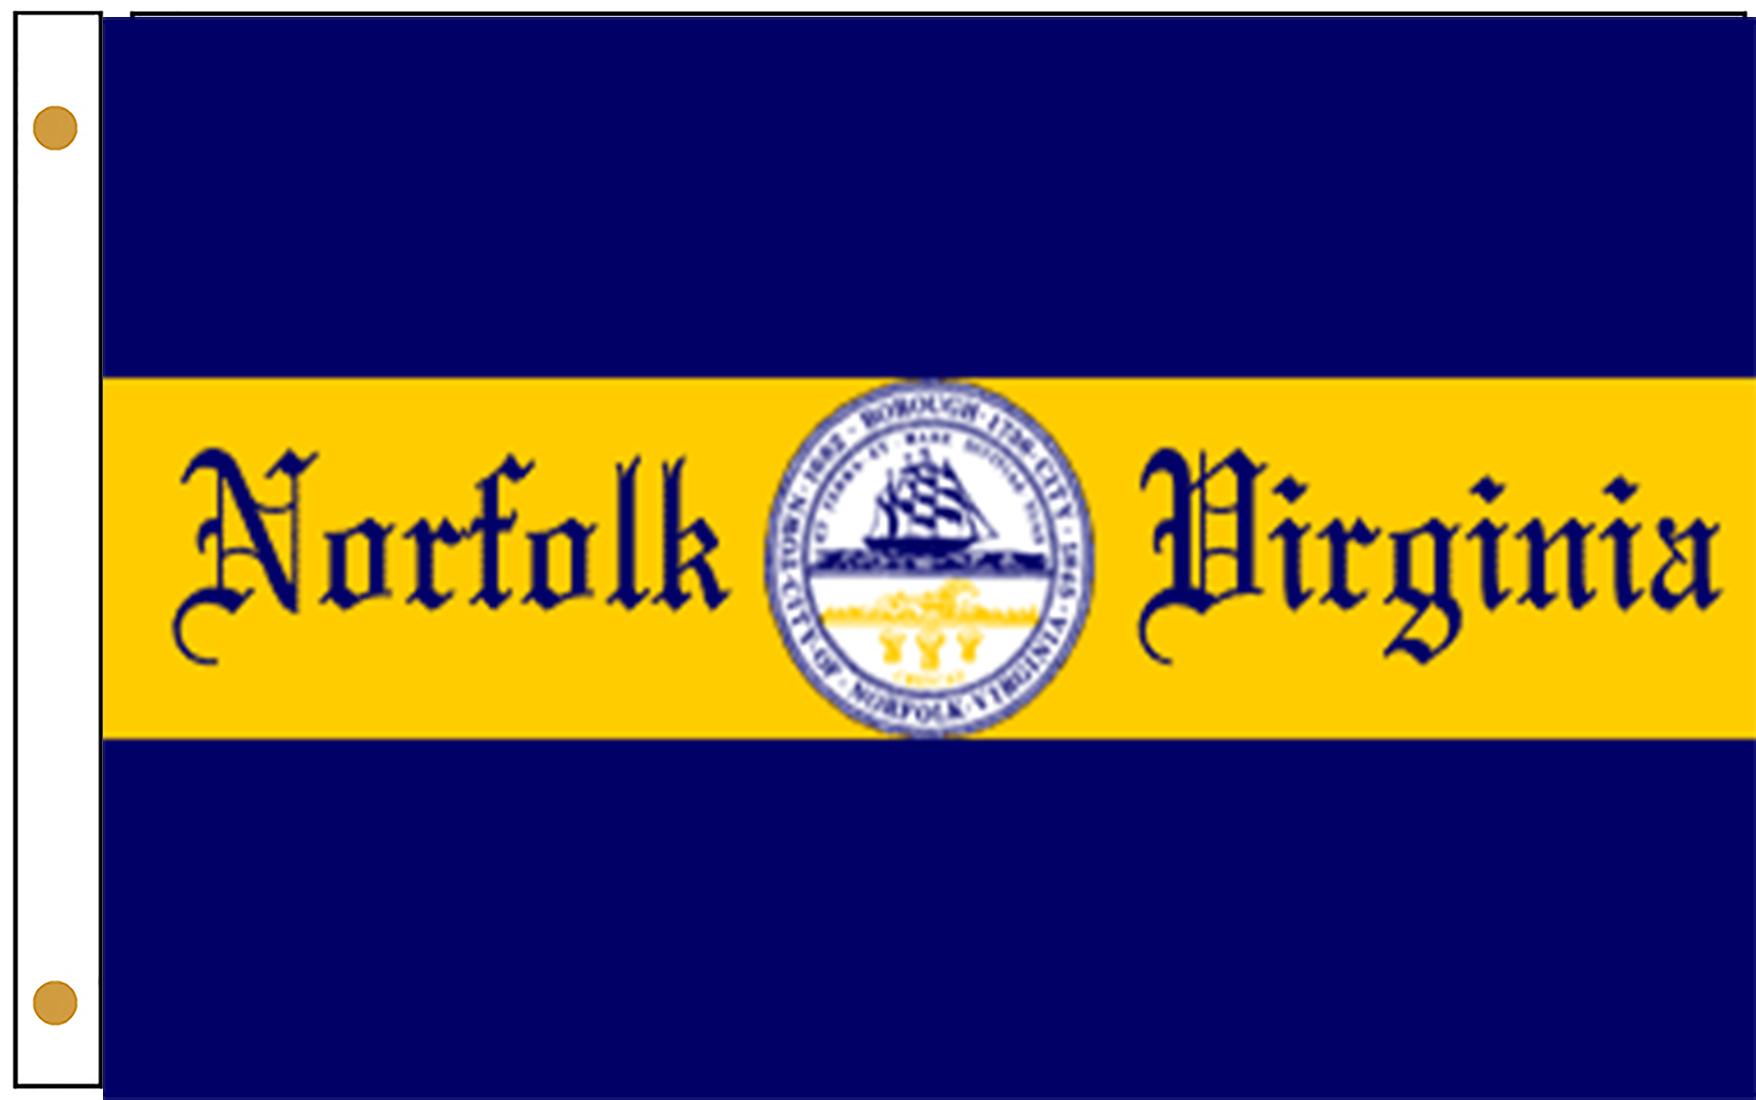 Norfolk VA Flags